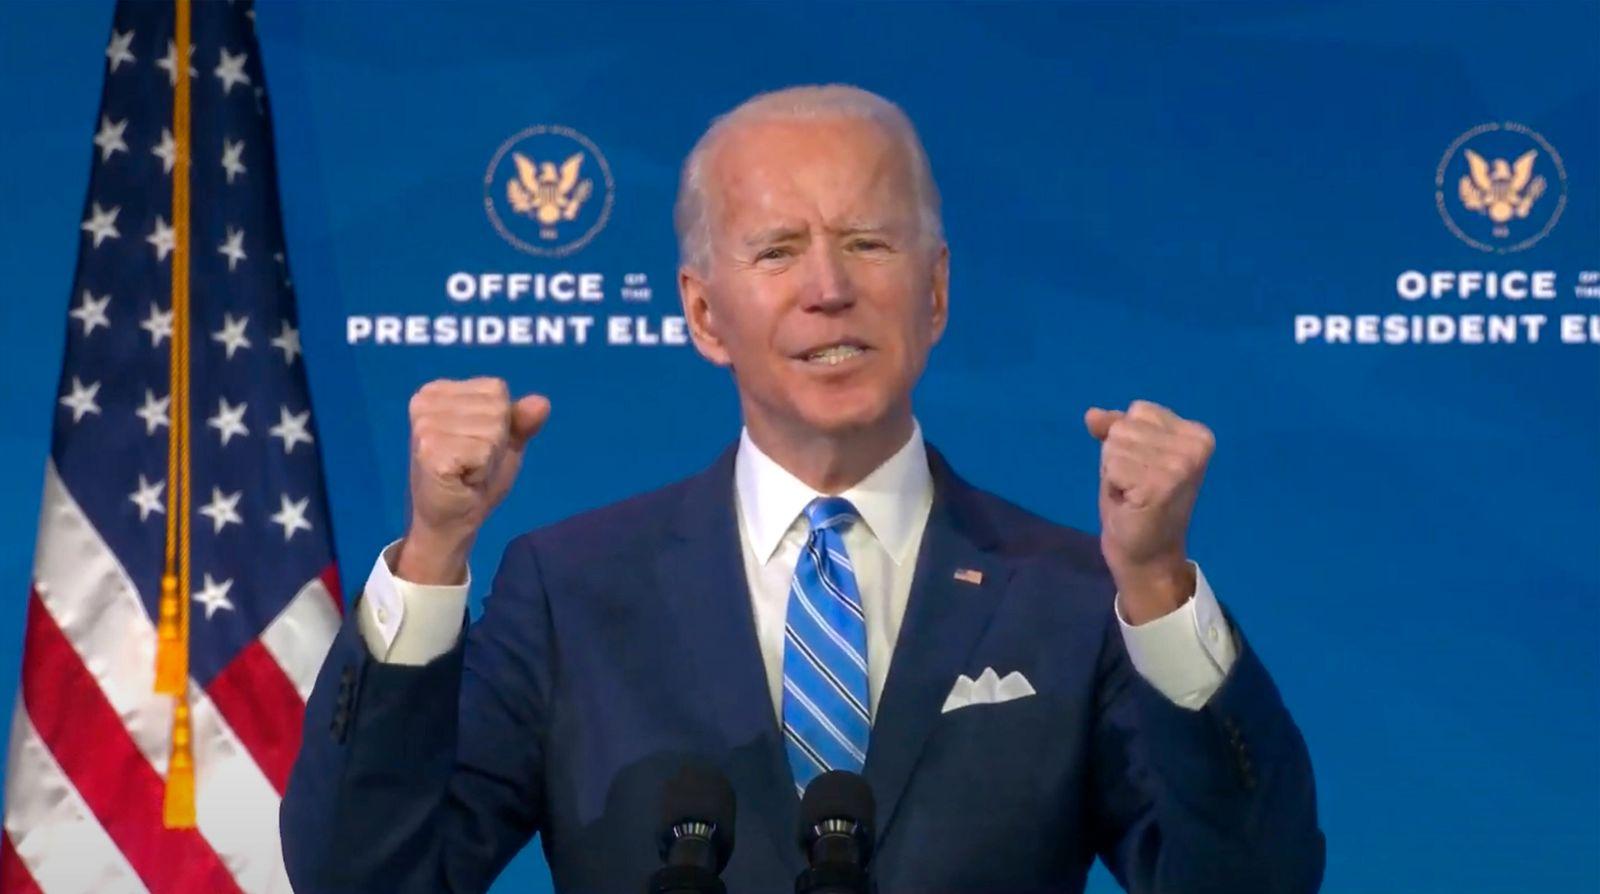 January 14, 2021, Wilmington, Delaware, USA: United States President-elect Joe Biden makes remarks on the Public Health